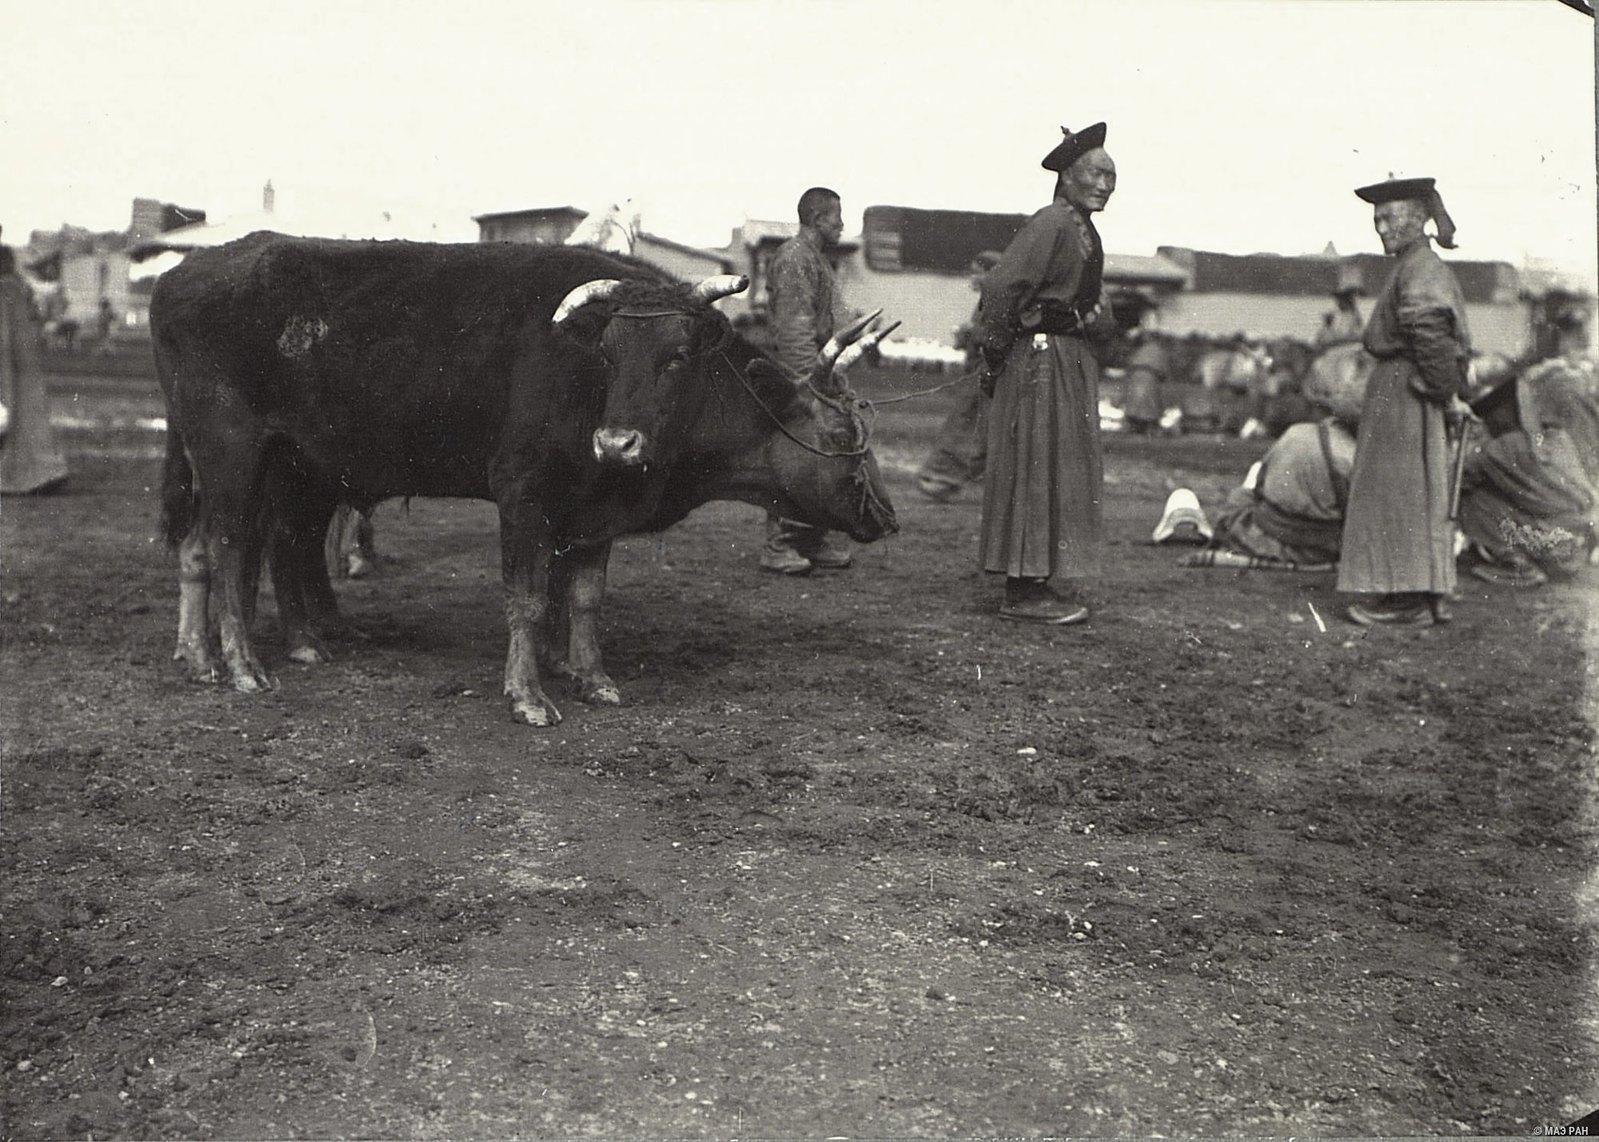 Урга. Рогатый скот на Ургинском базаре